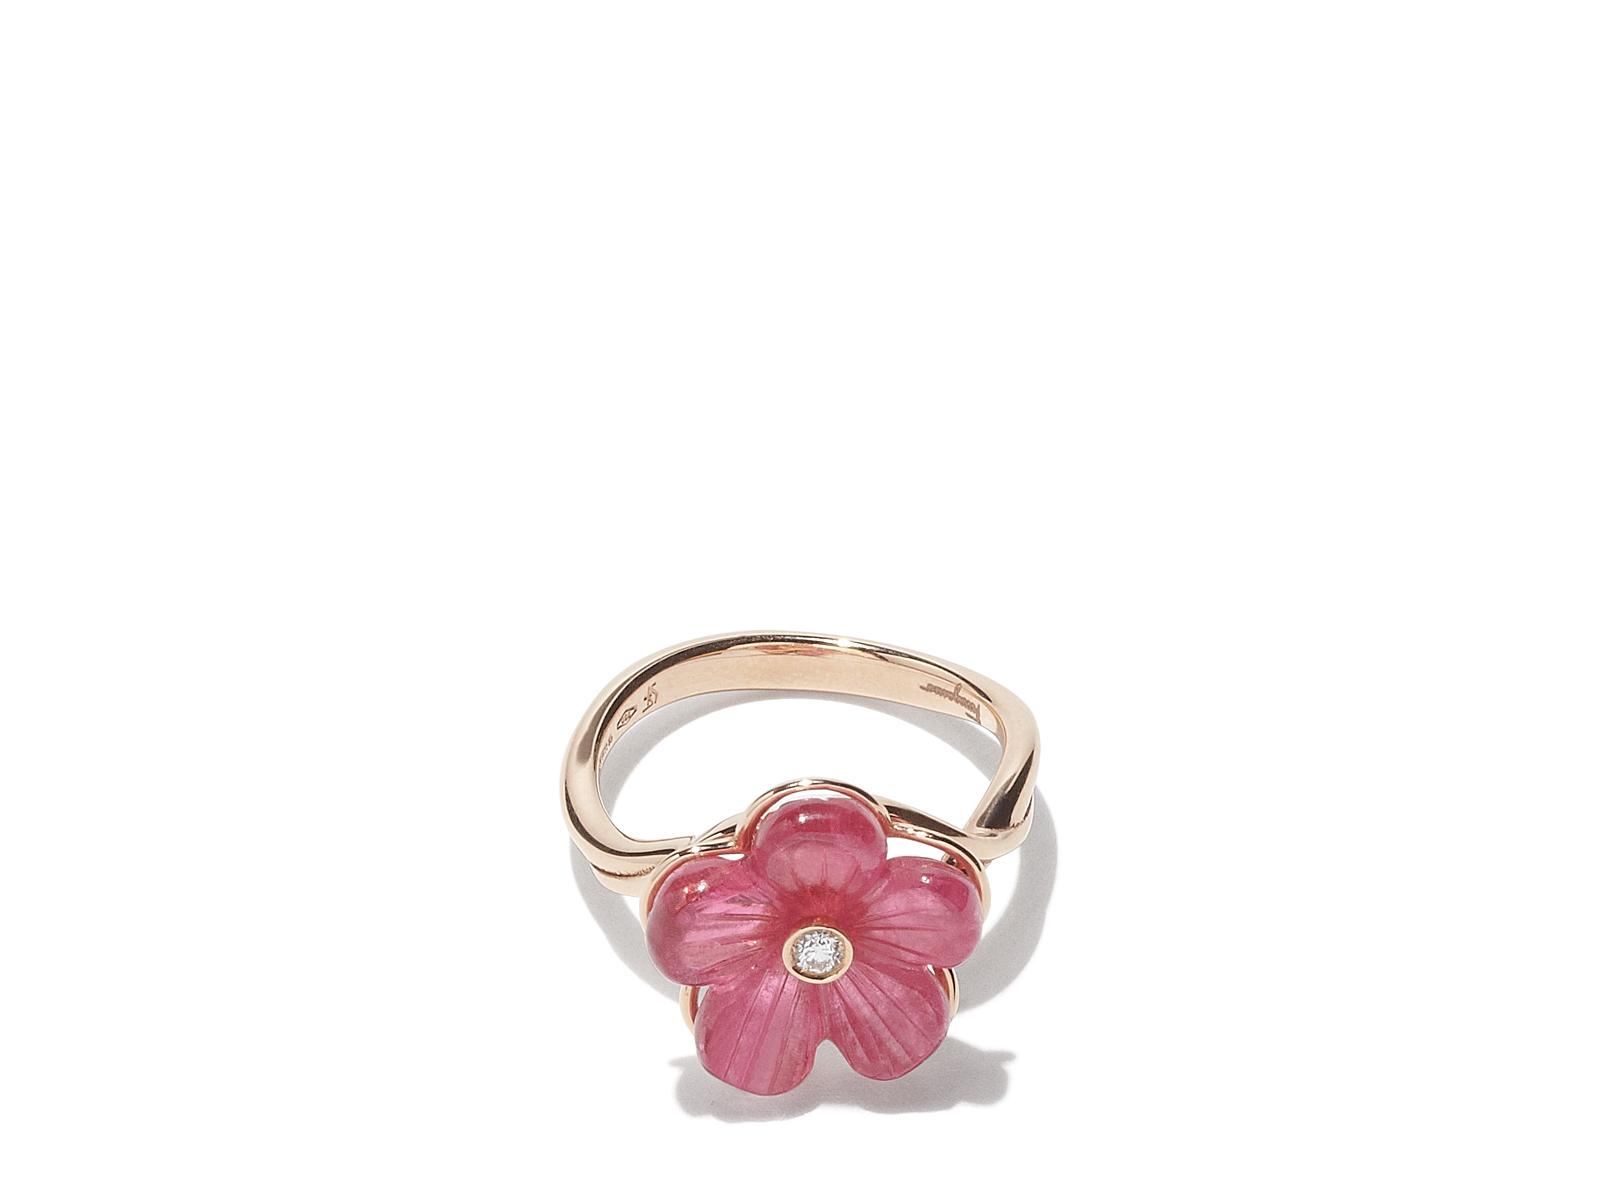 Ferragamo Flower Ring in Pink